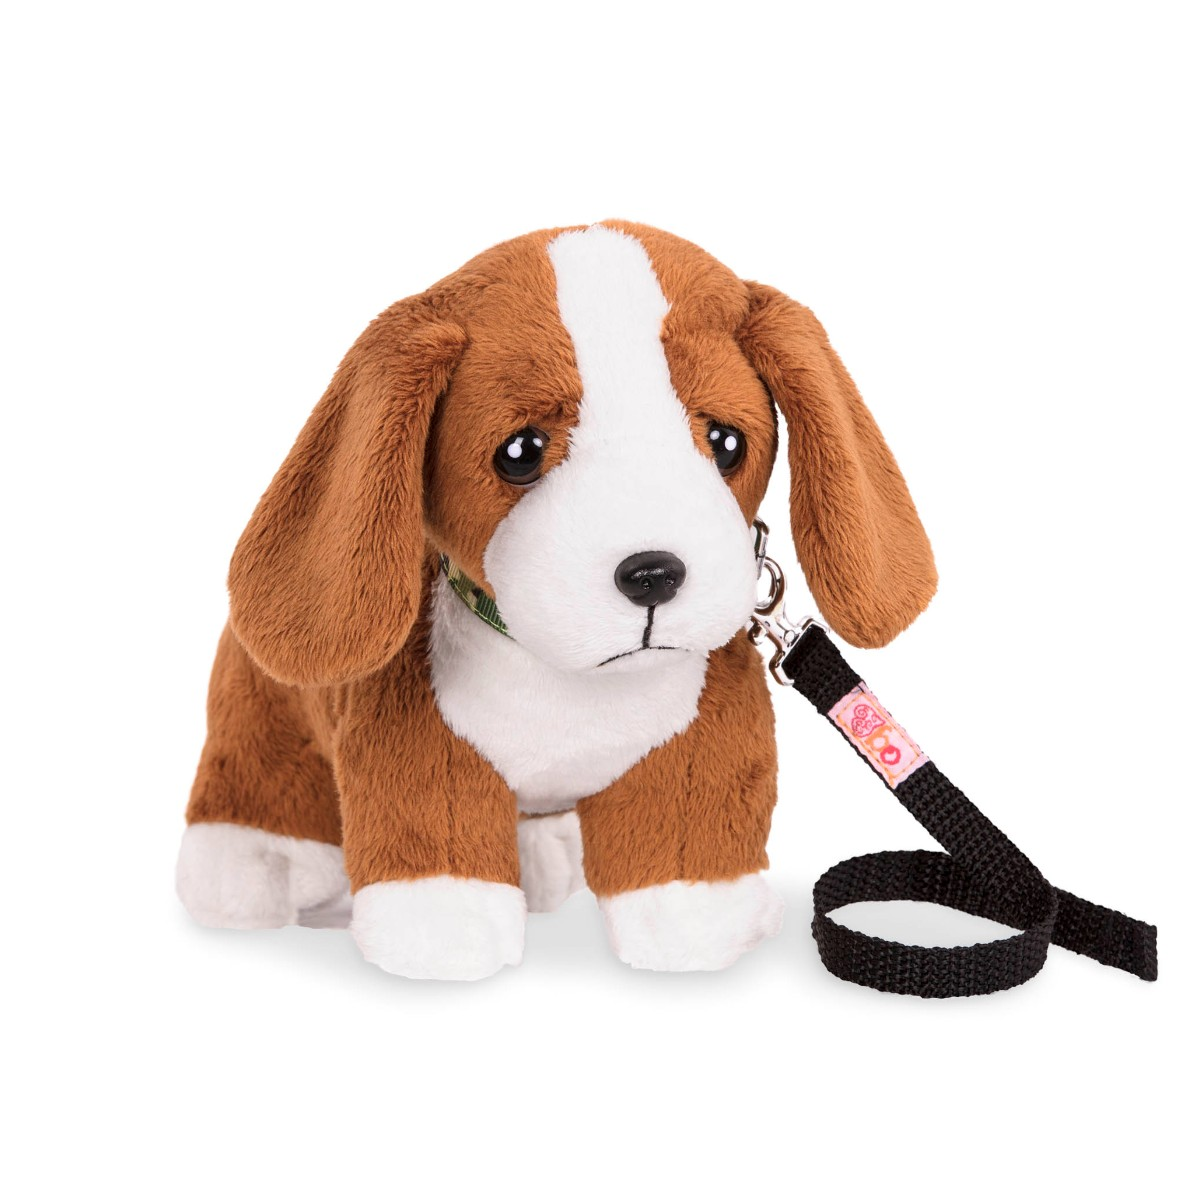 Our Generation - Basset Puppy dog (737820)